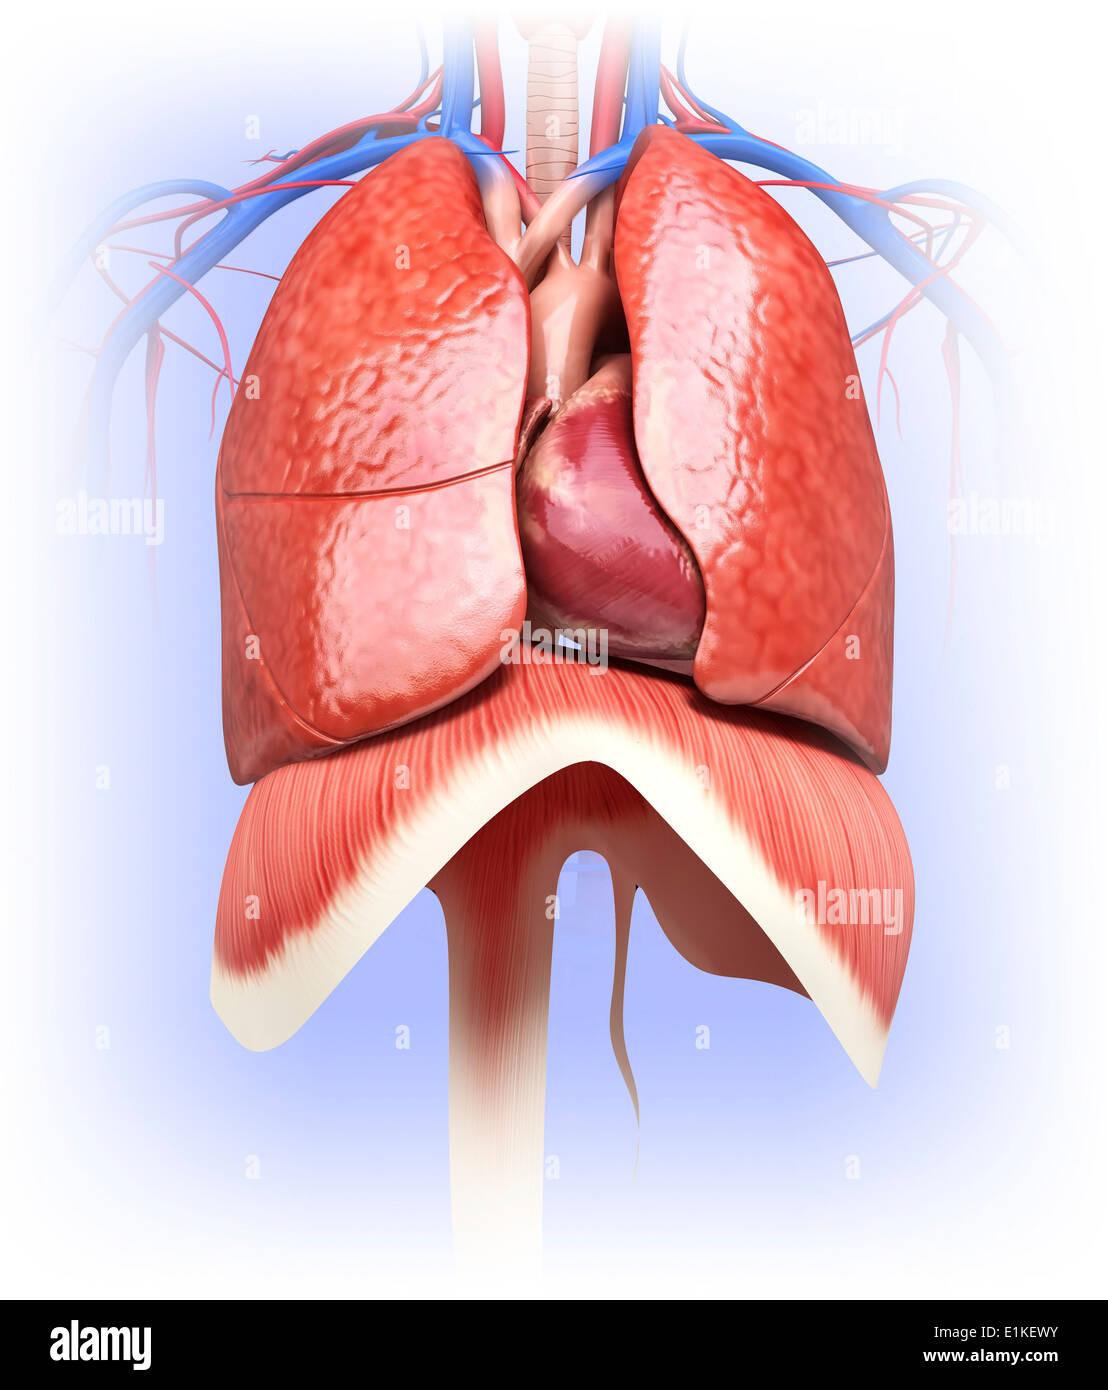 human heart and lungs diagram hayward super ii pump wiring computer artwork stock photo 69884919 alamy